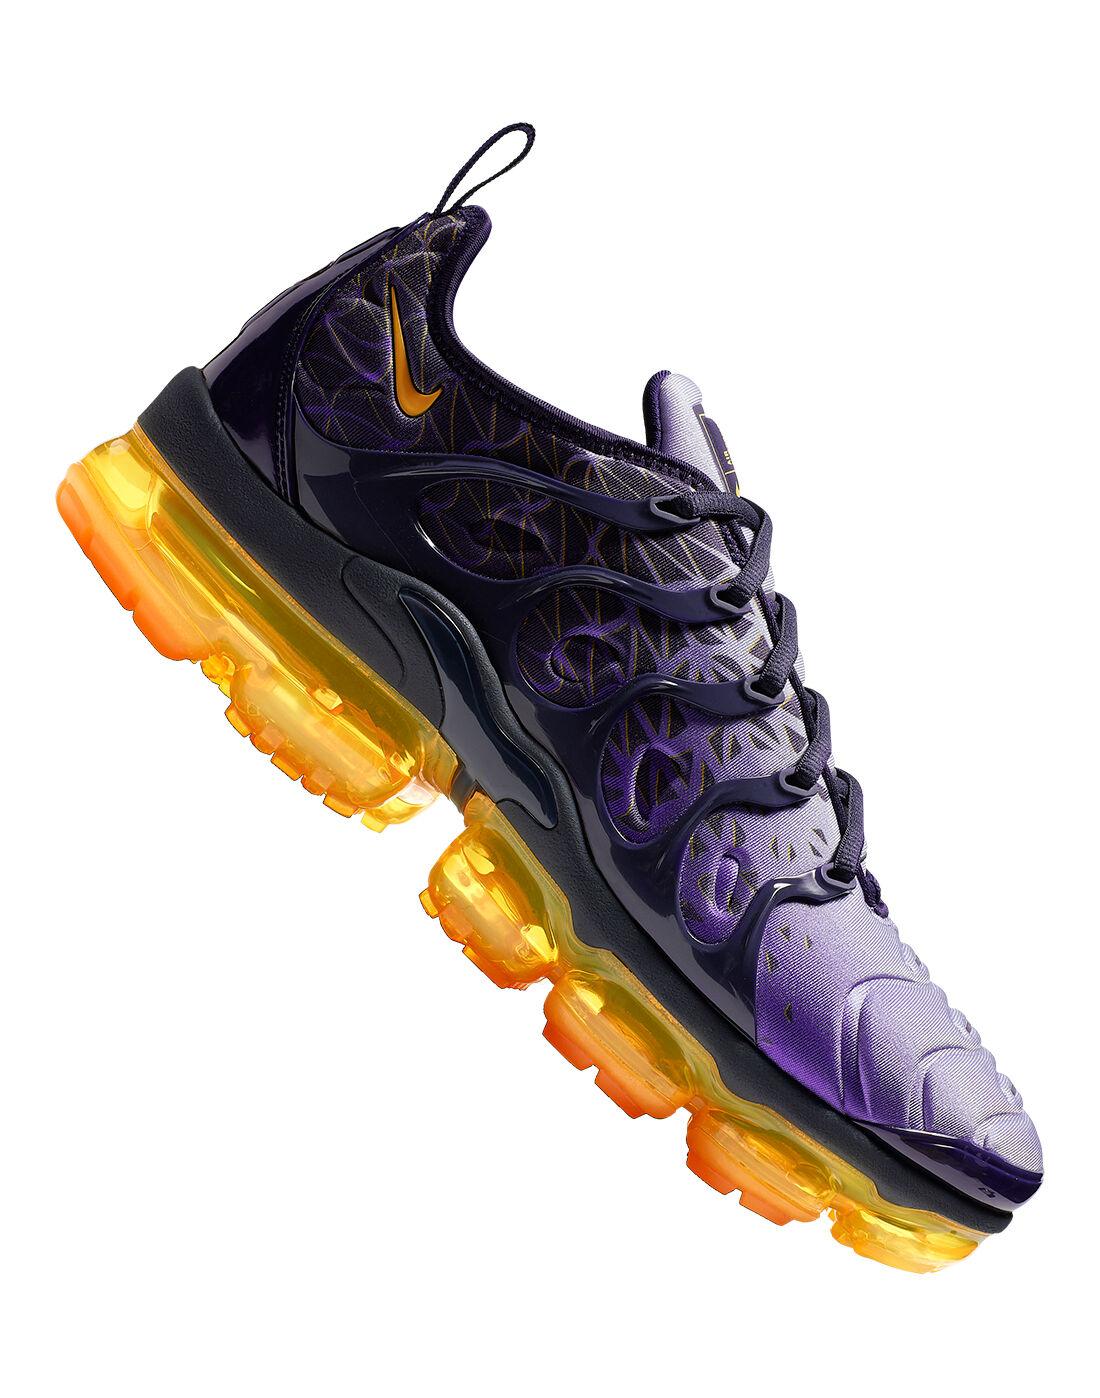 Orange Nike Vapormax Plus